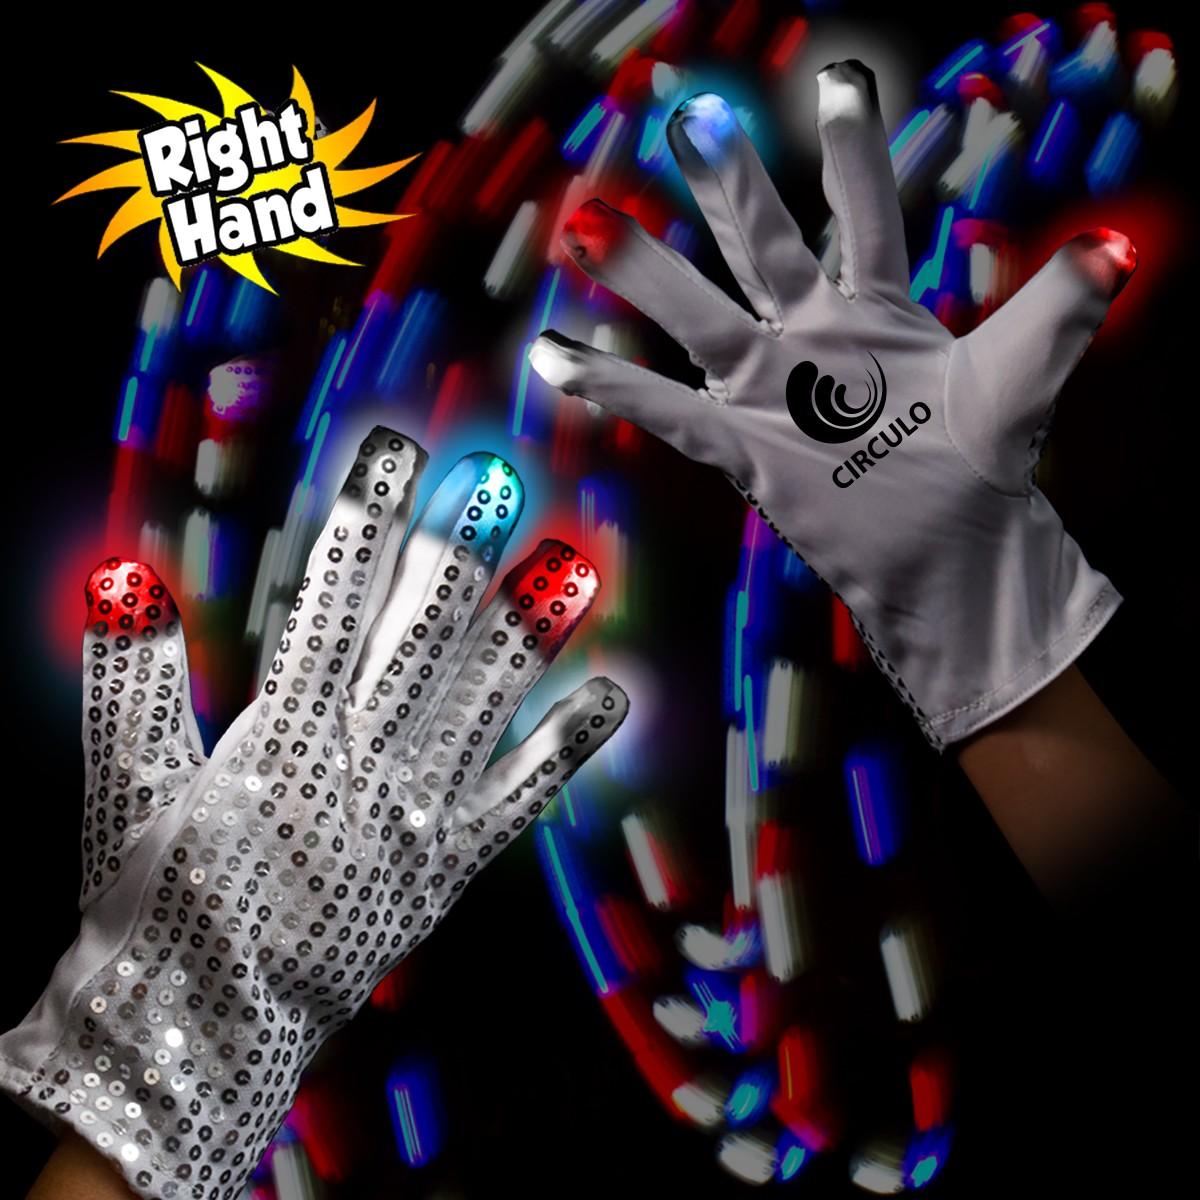 Patriotic LED Rock Star Glove (Right Hand)